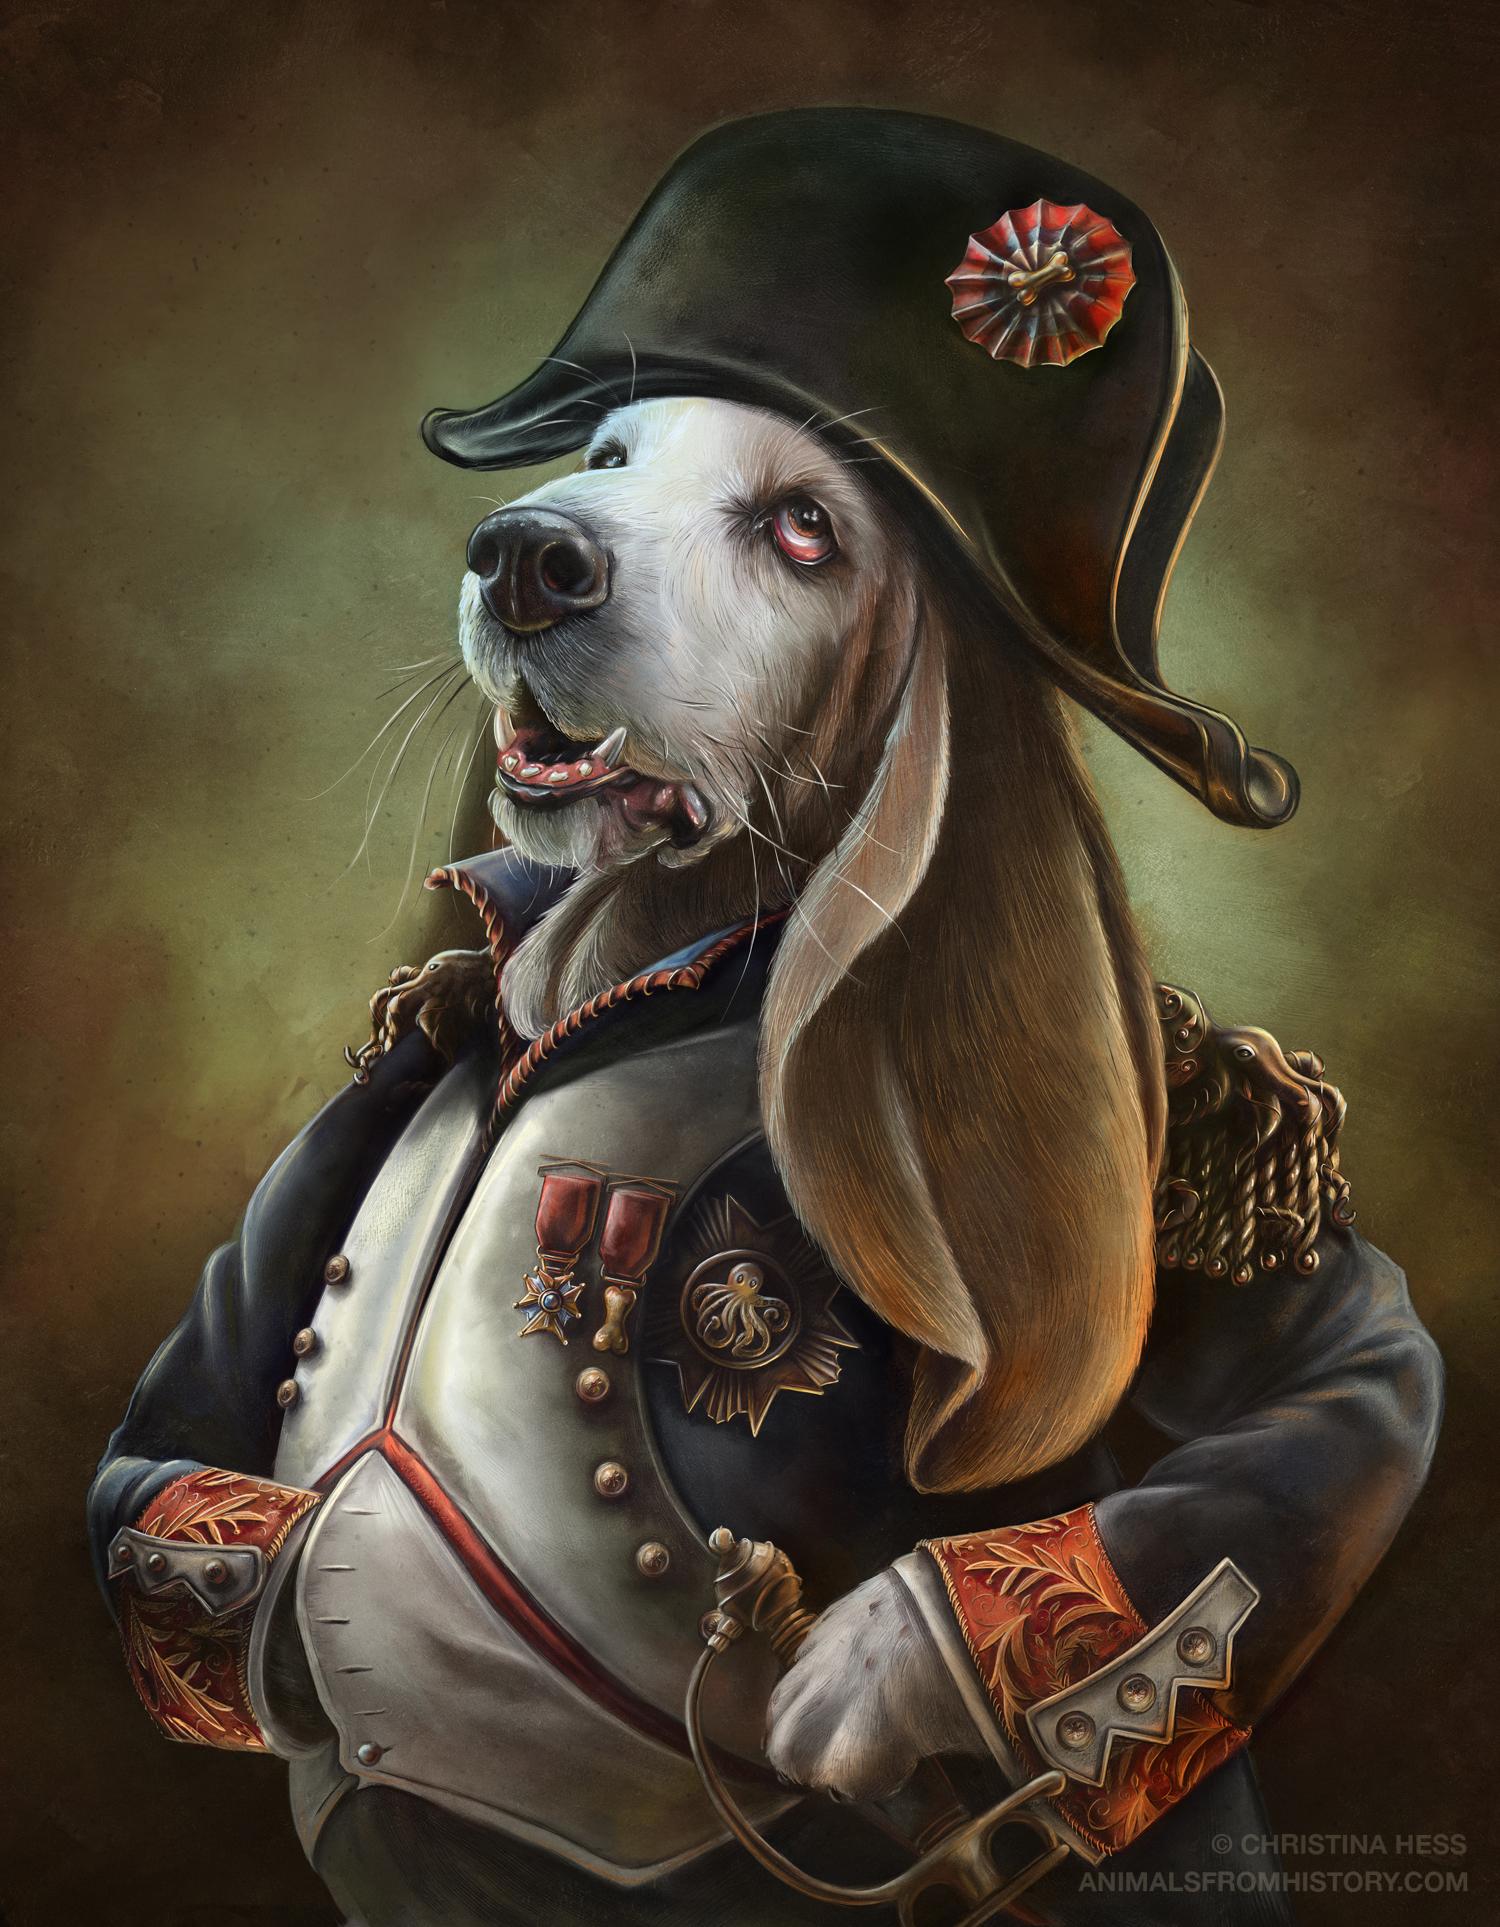 napoleon-boneaparte-christina-hess-afh.jpg